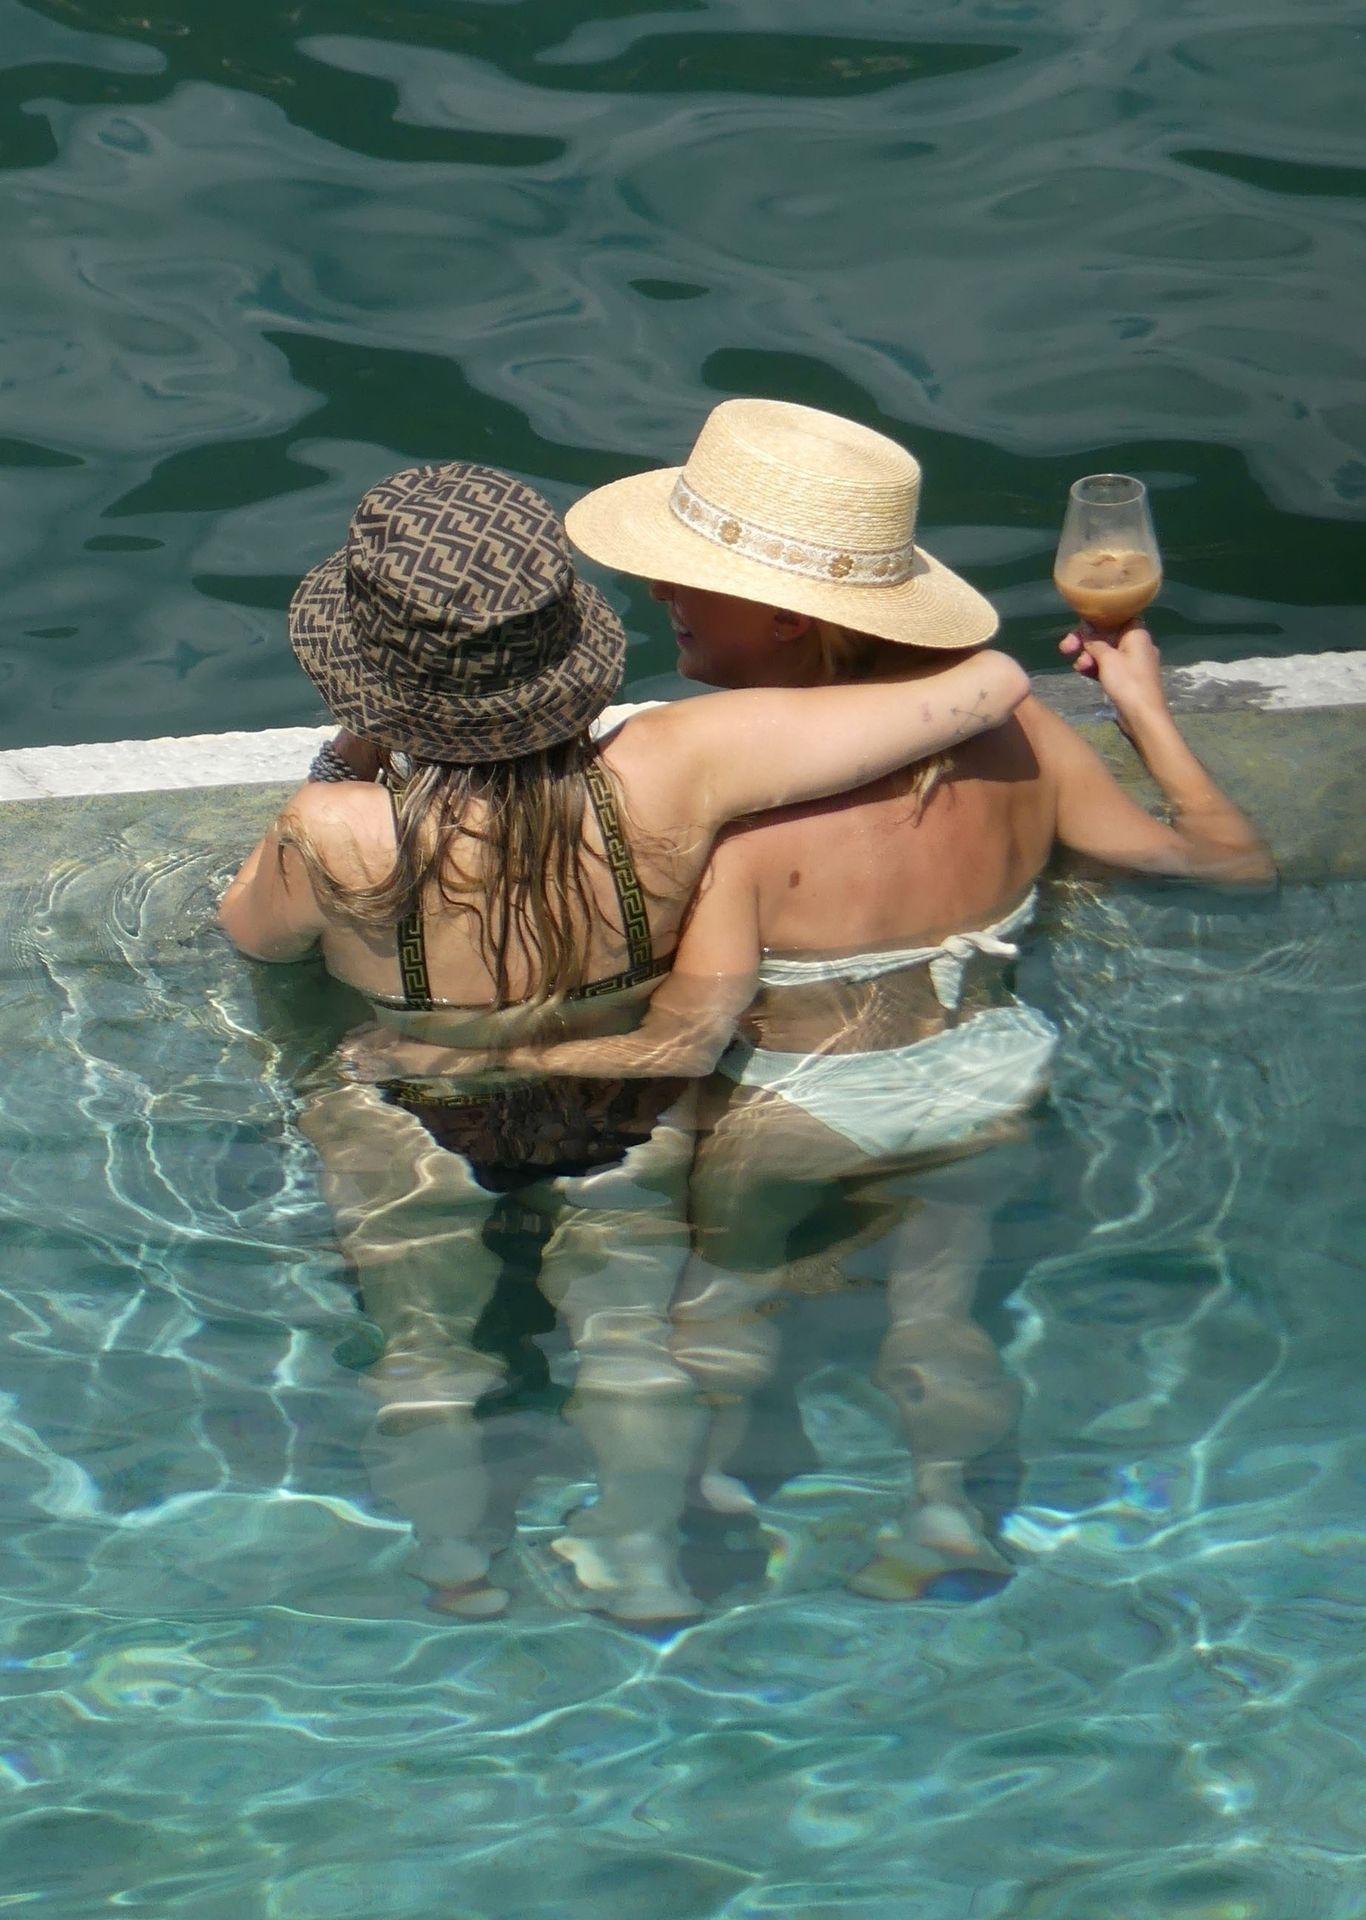 0713004446900_51_Miley-Cyrus-Topless-Kaitlynn-Carter-Hot-TheFappeningBlog.com-51.jpg